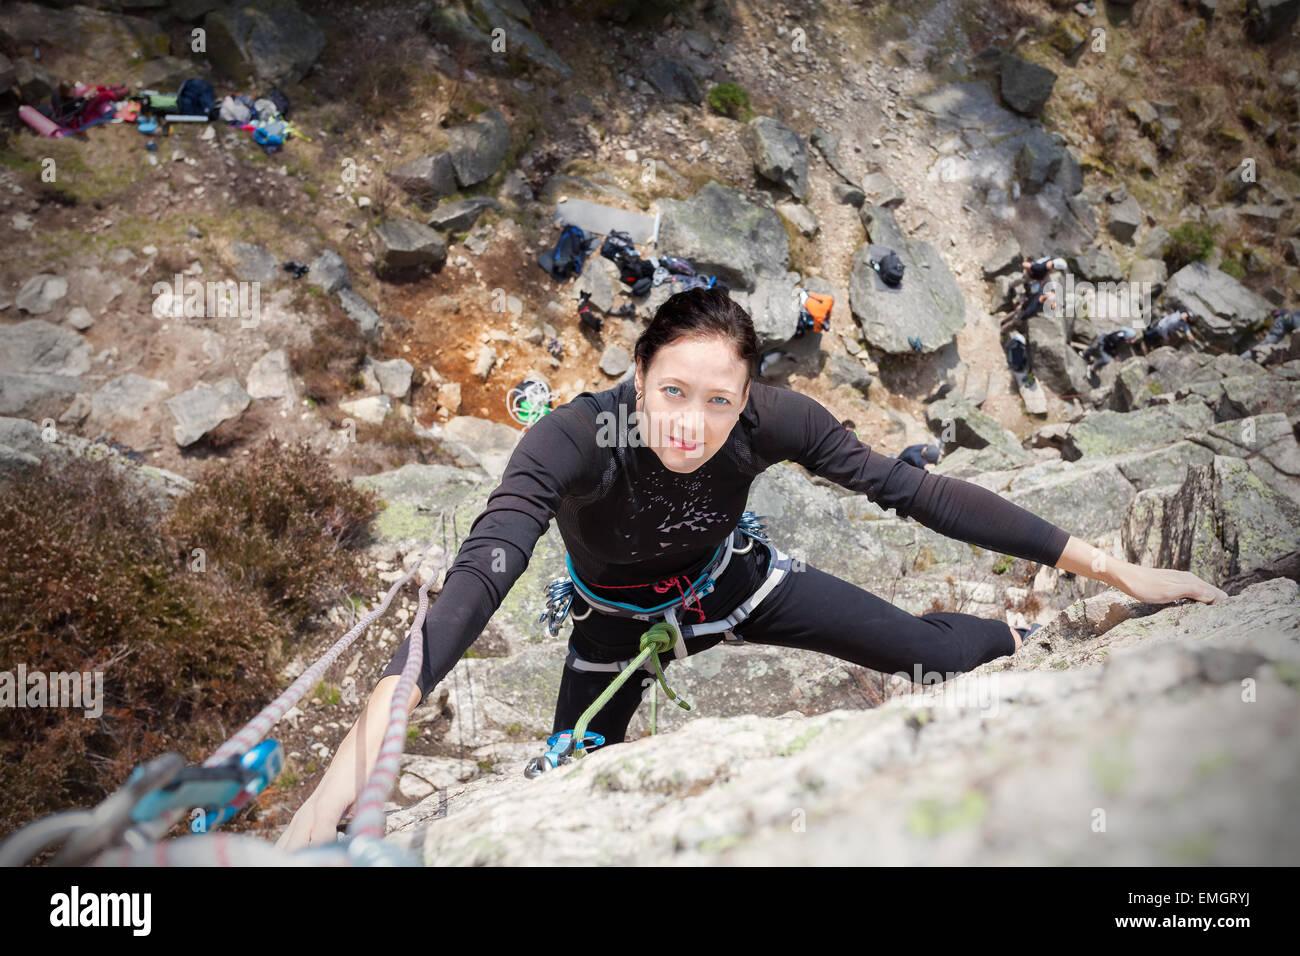 Jeune femme mur d'escalade, femme active concept photo. Photo Stock